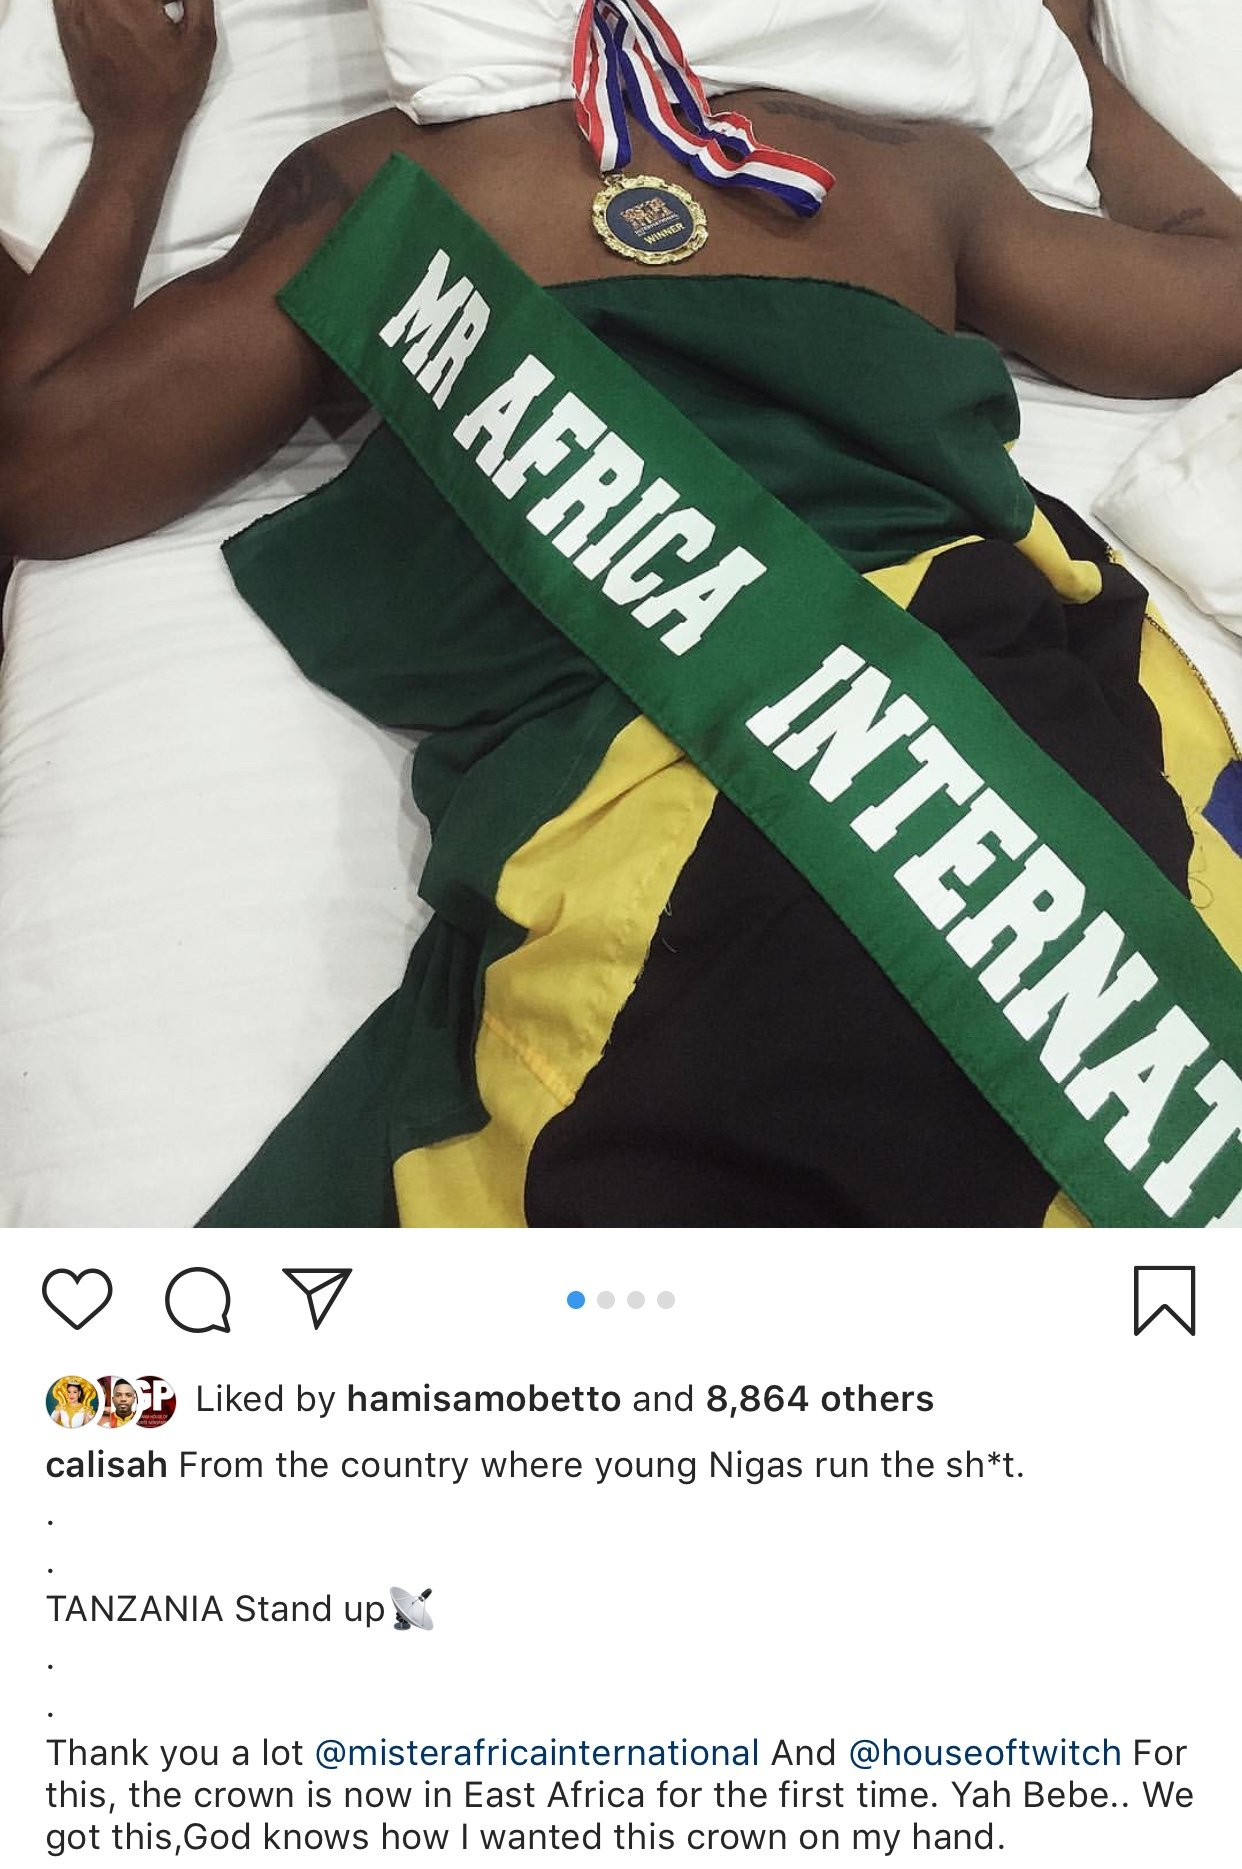 Calisah Amwaga Povu Zito Baada Ya Kushinda Mr. Africa